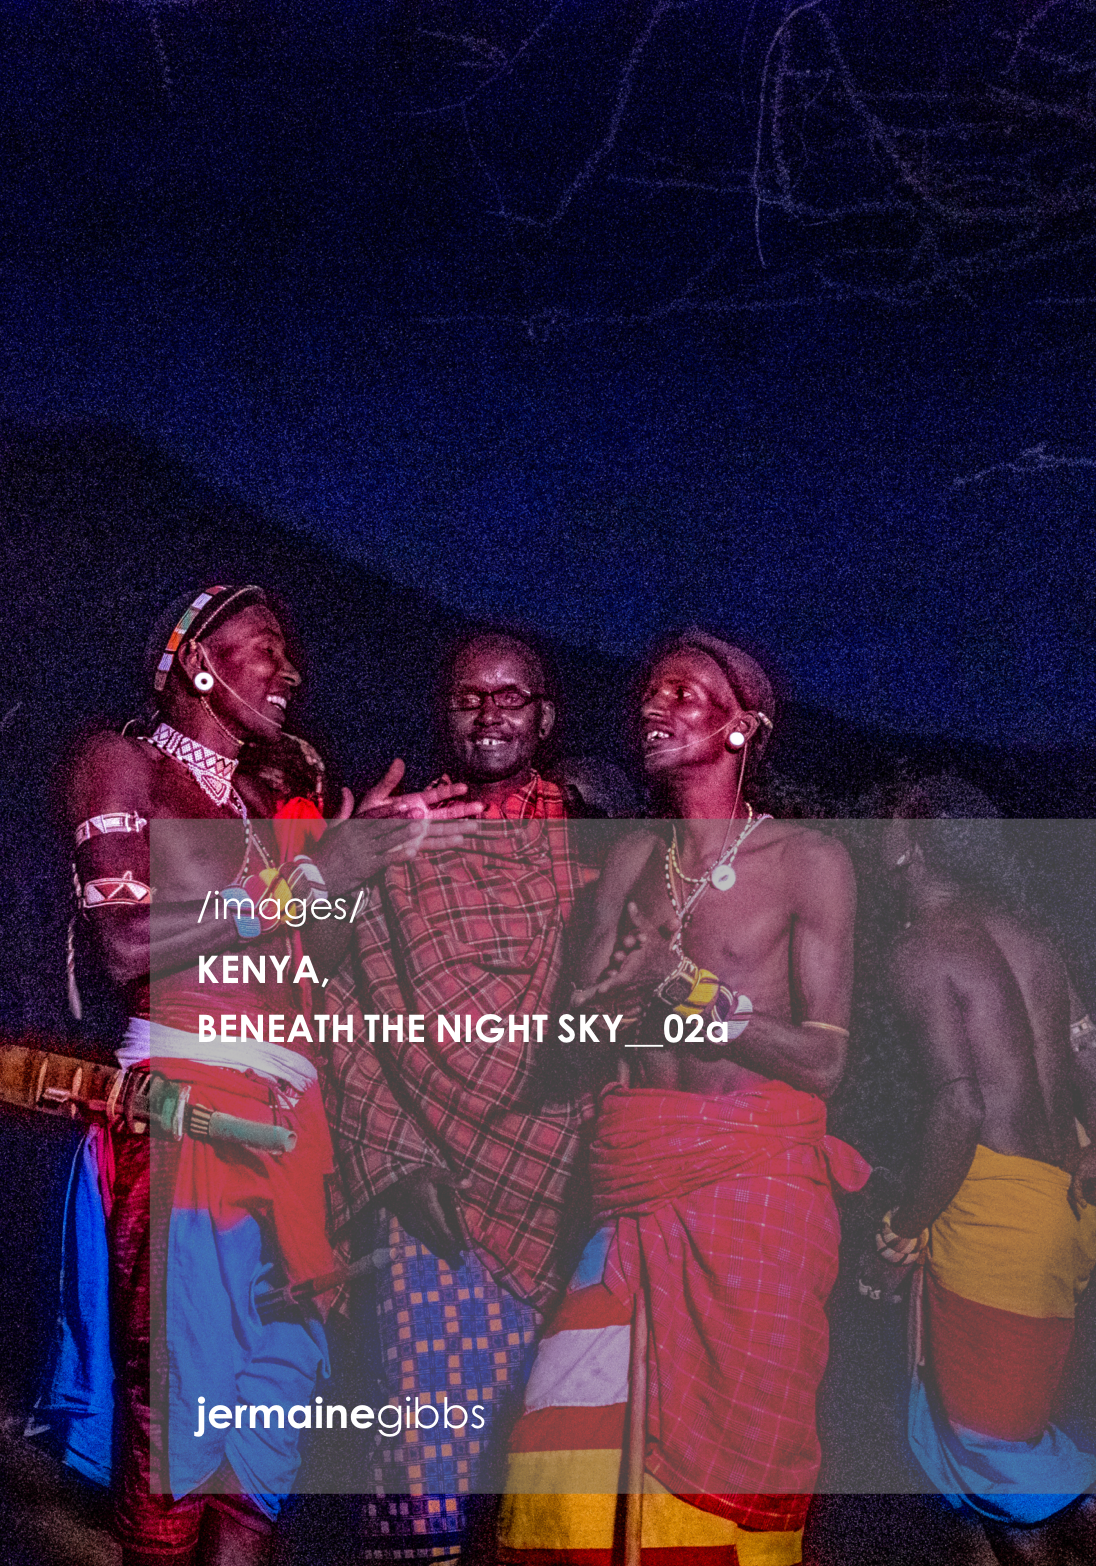 Kenya_Beneath The Night Sky__02a